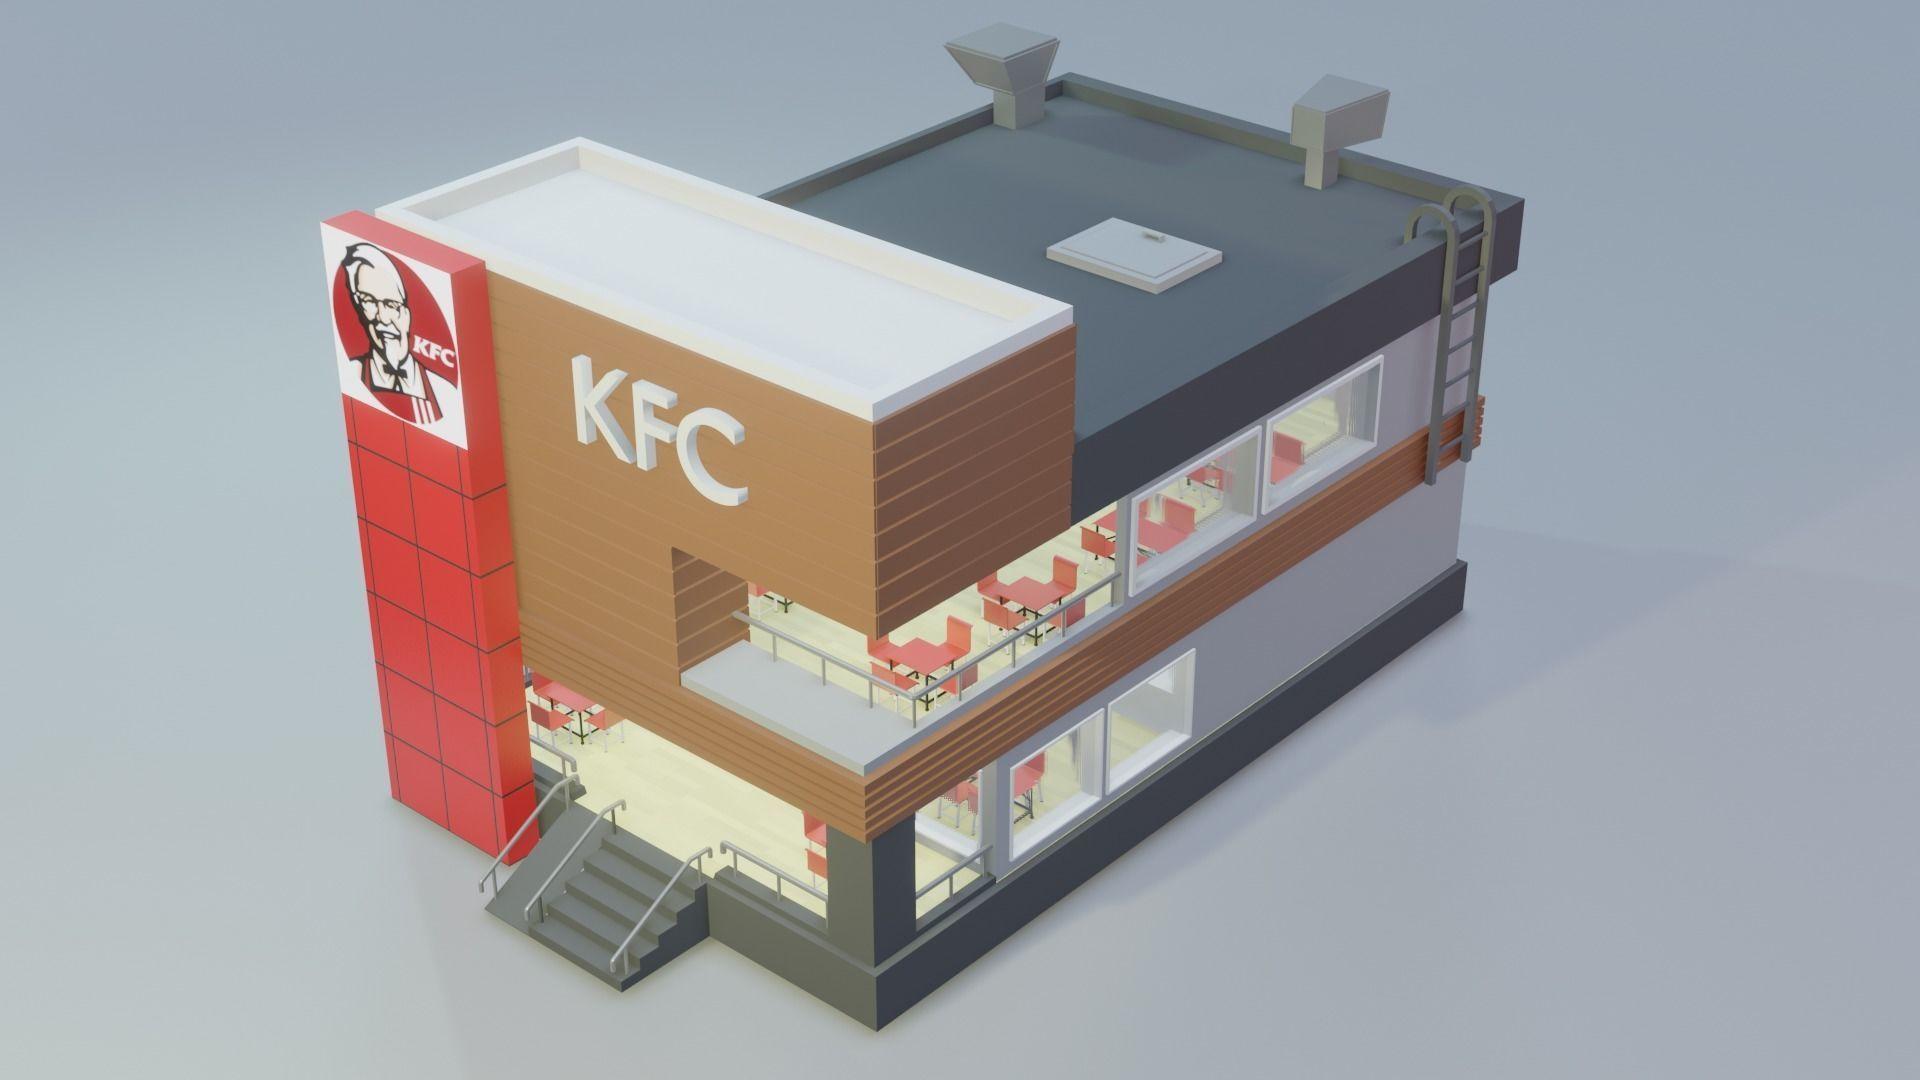 KFC - Low Poly